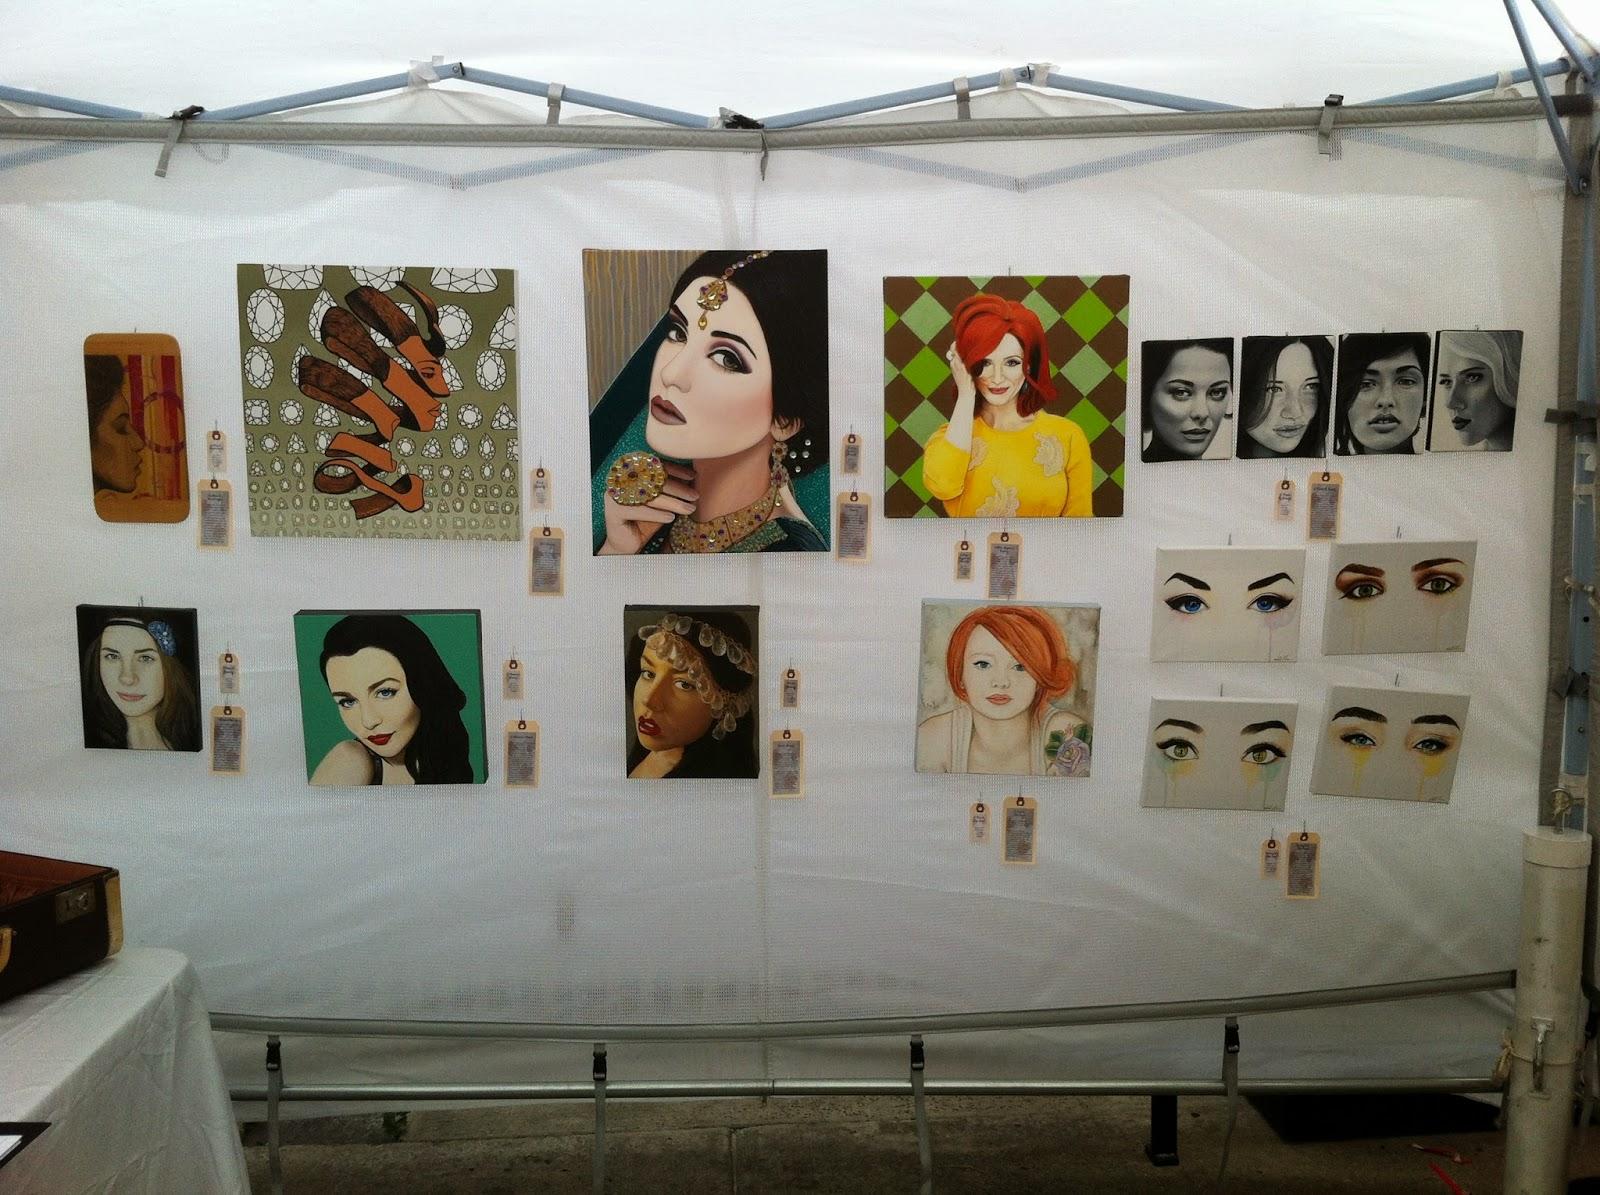 art walk north, artists network, north york art festival, toronto art, malinda prudhomme, portrait artist, awn, portrait painting, beauty art